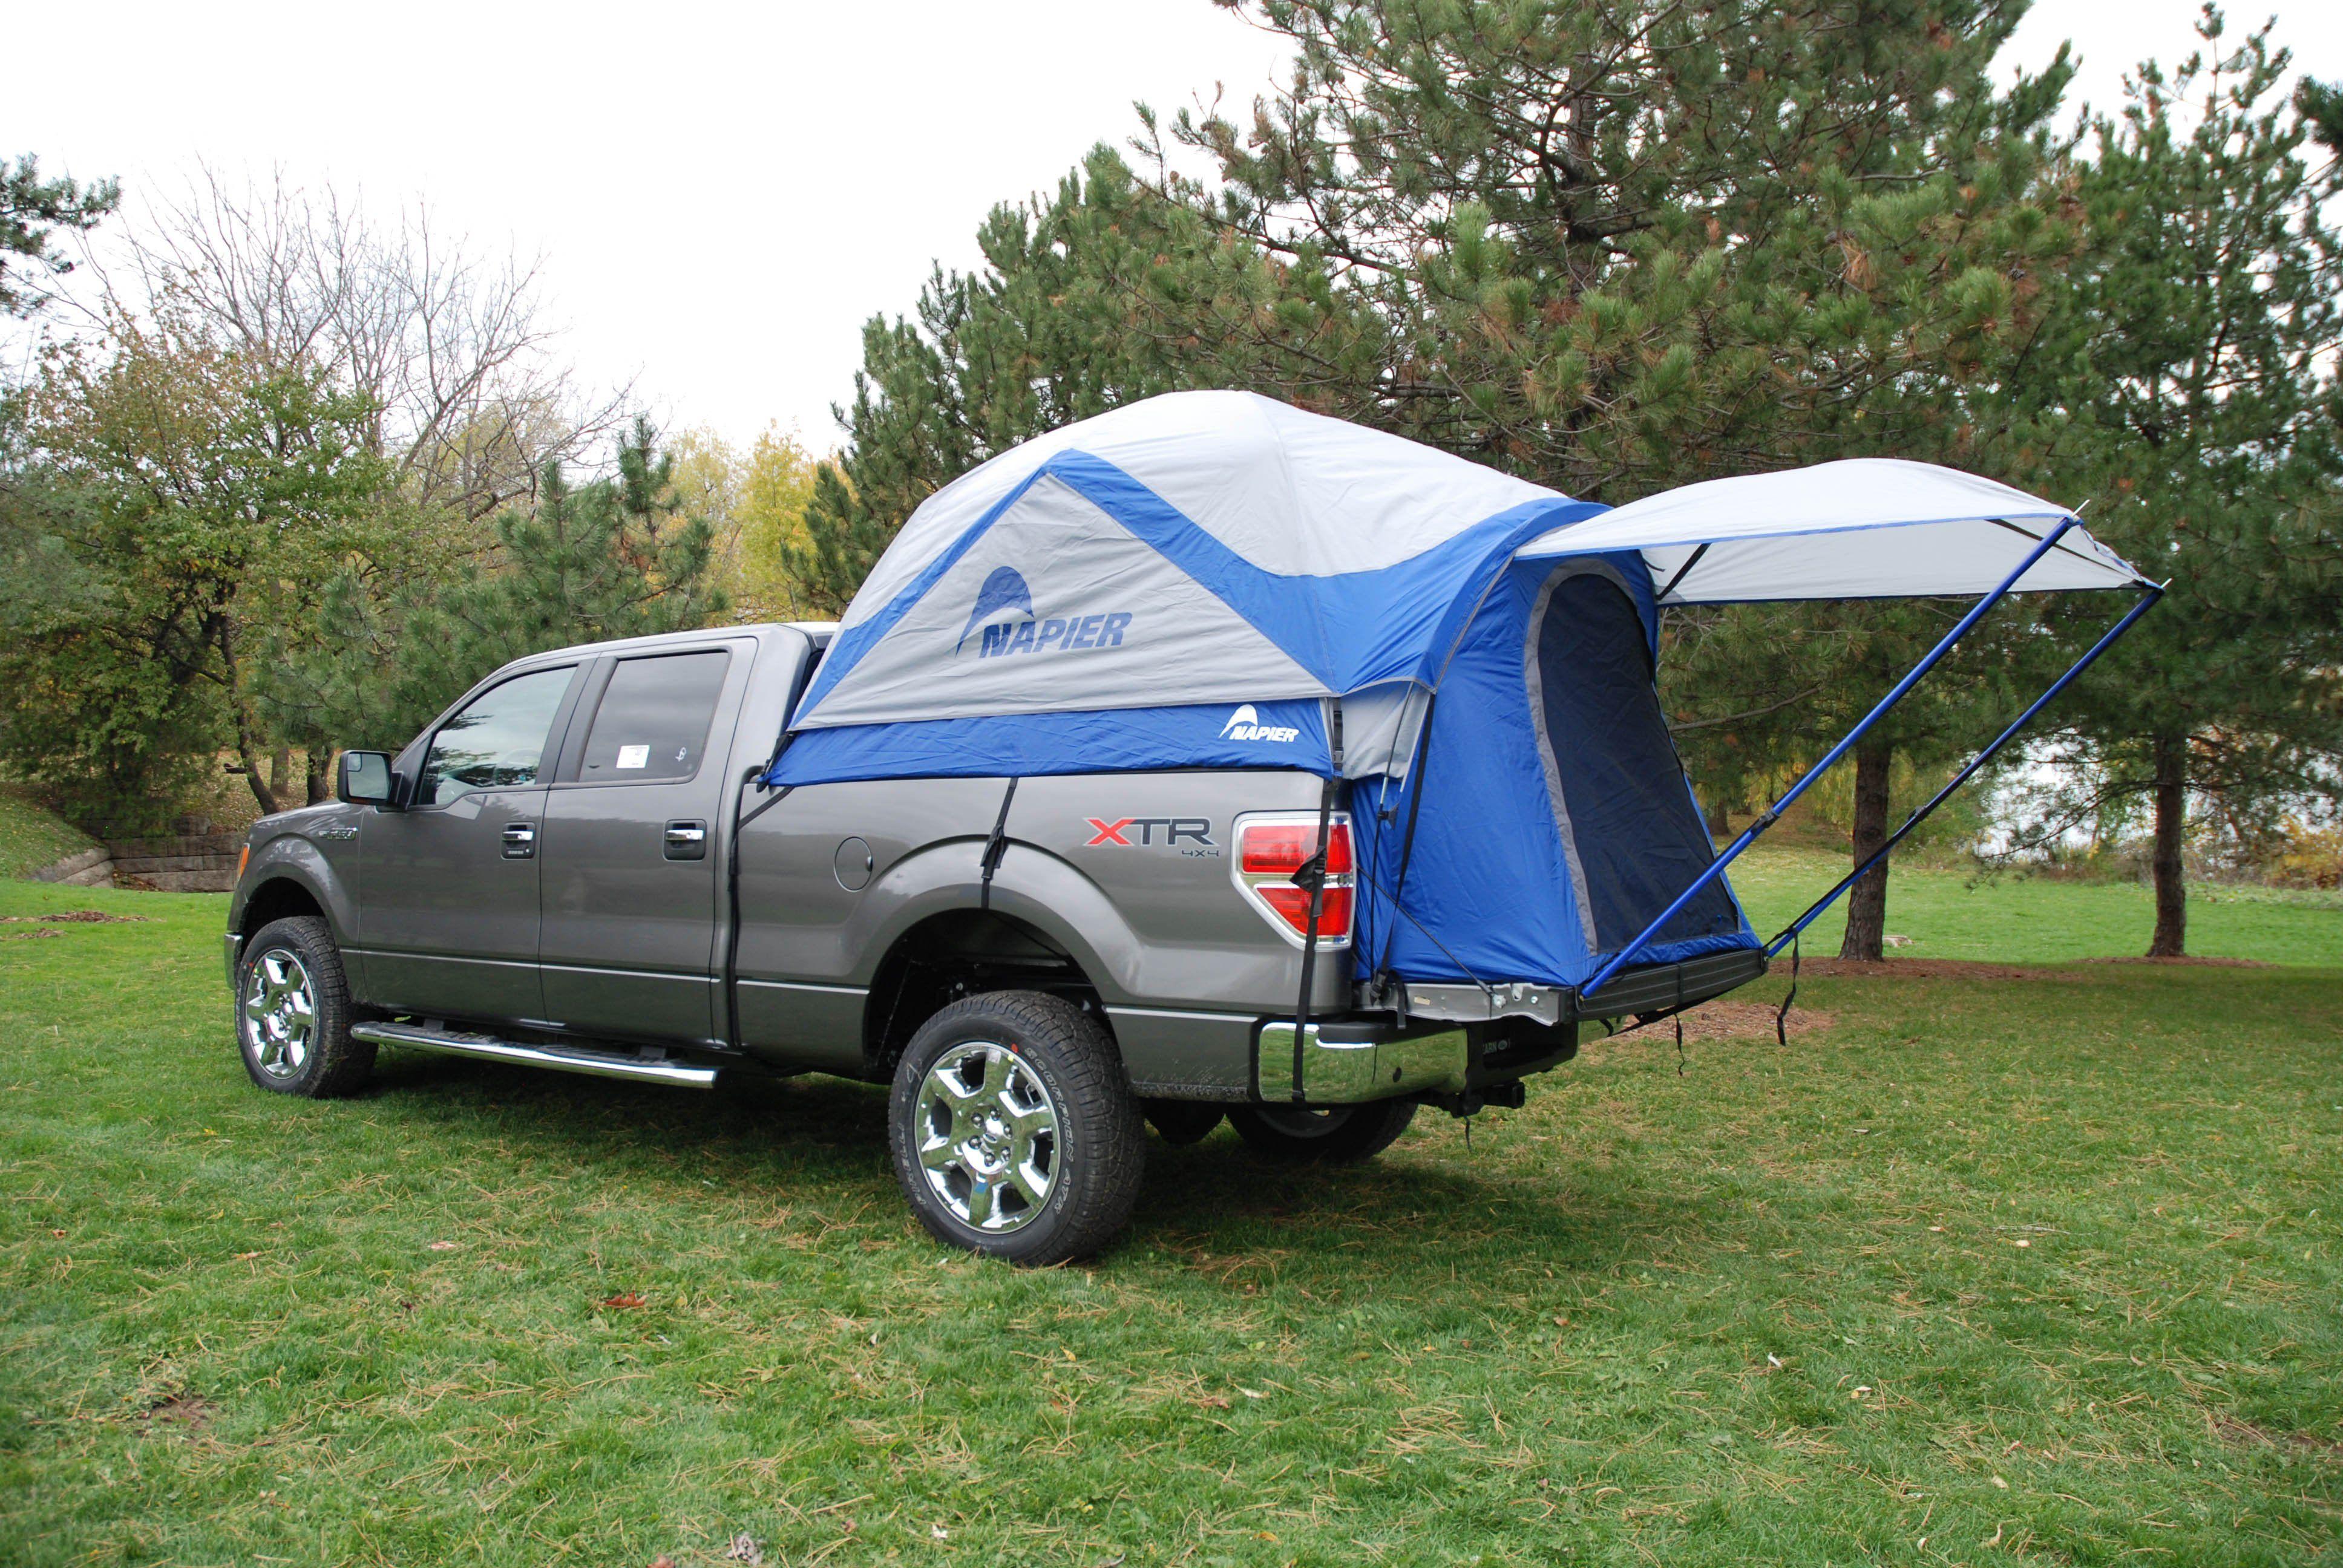 Napier Sportz Truck Tent 57 Series fits 8 ft. bed Truck